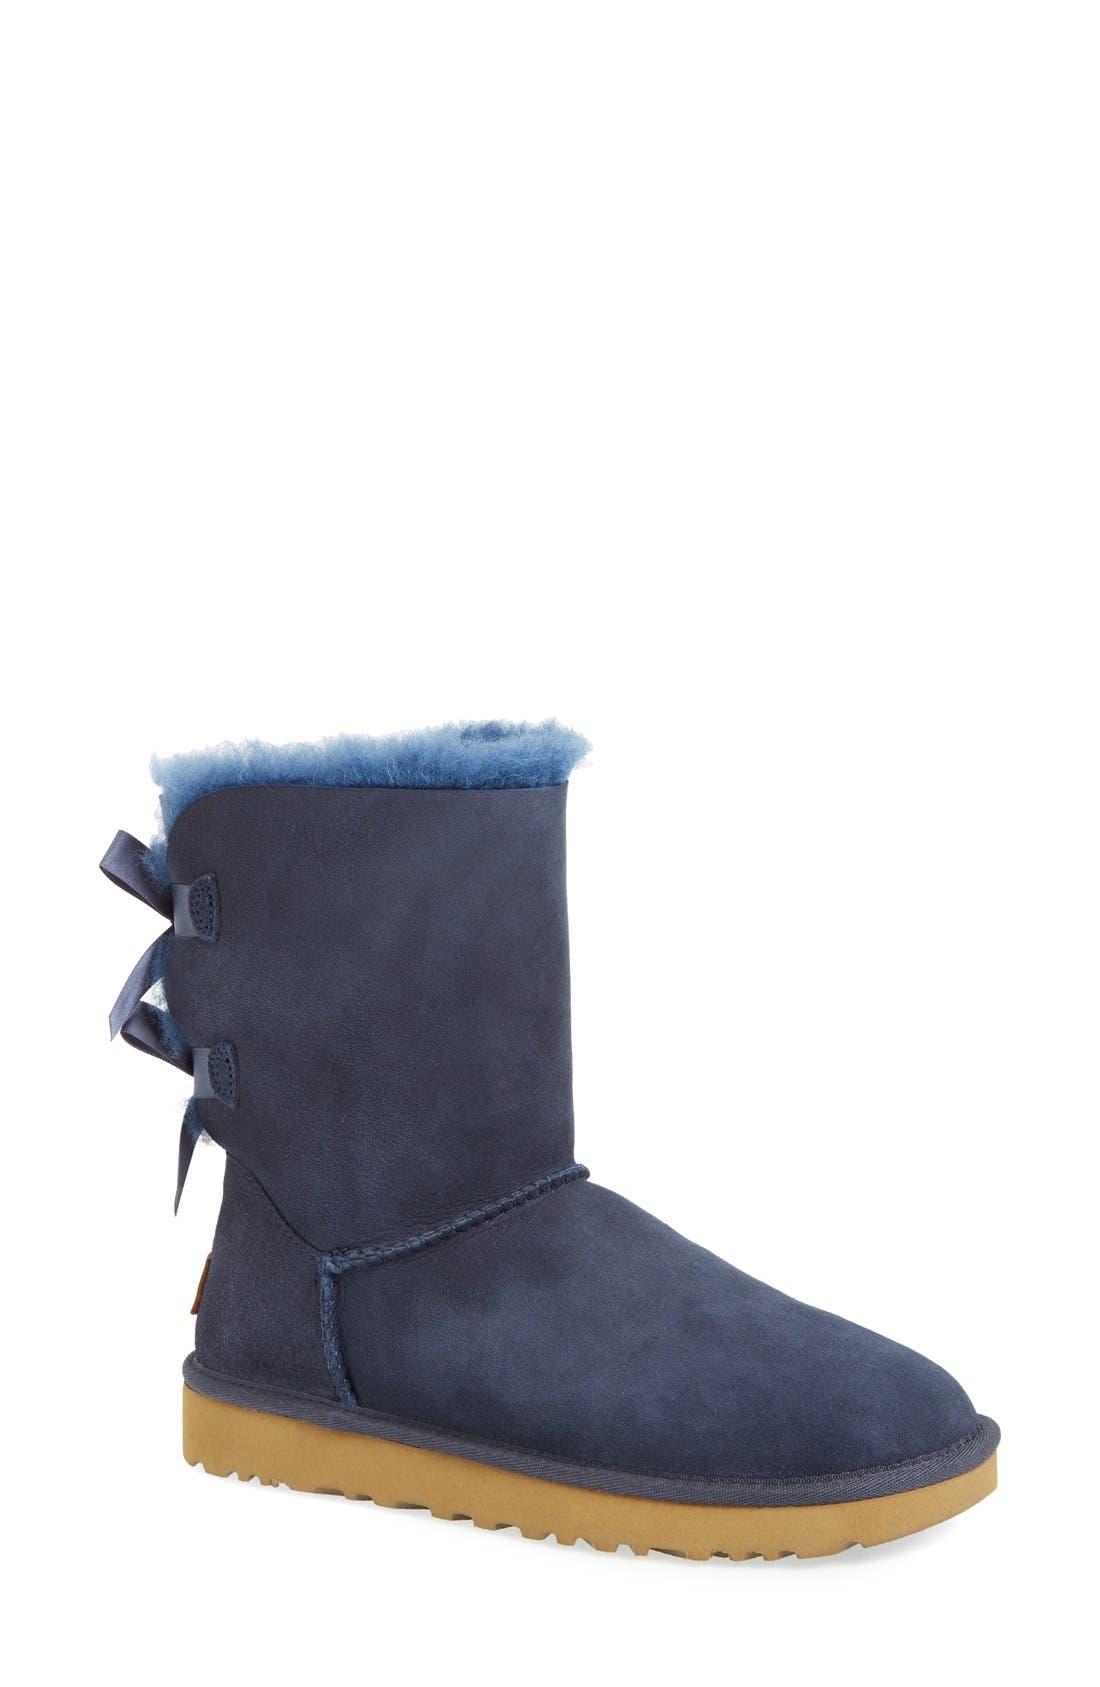 blue ugg boots sale